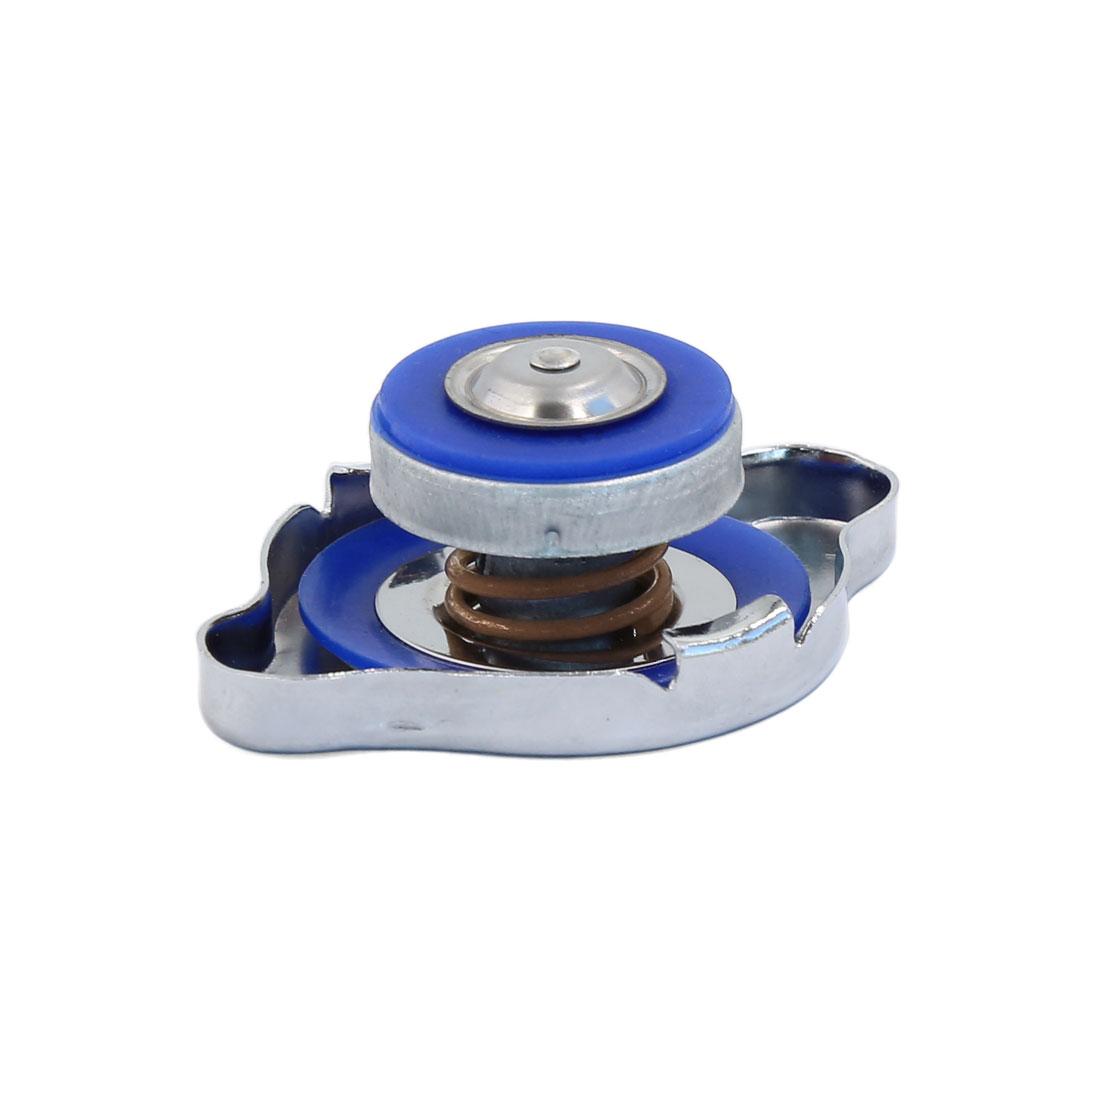 Universal Car Auto Coolant System Rubber Seal Pressure Radiator Cap 0.9Kgf/cm2